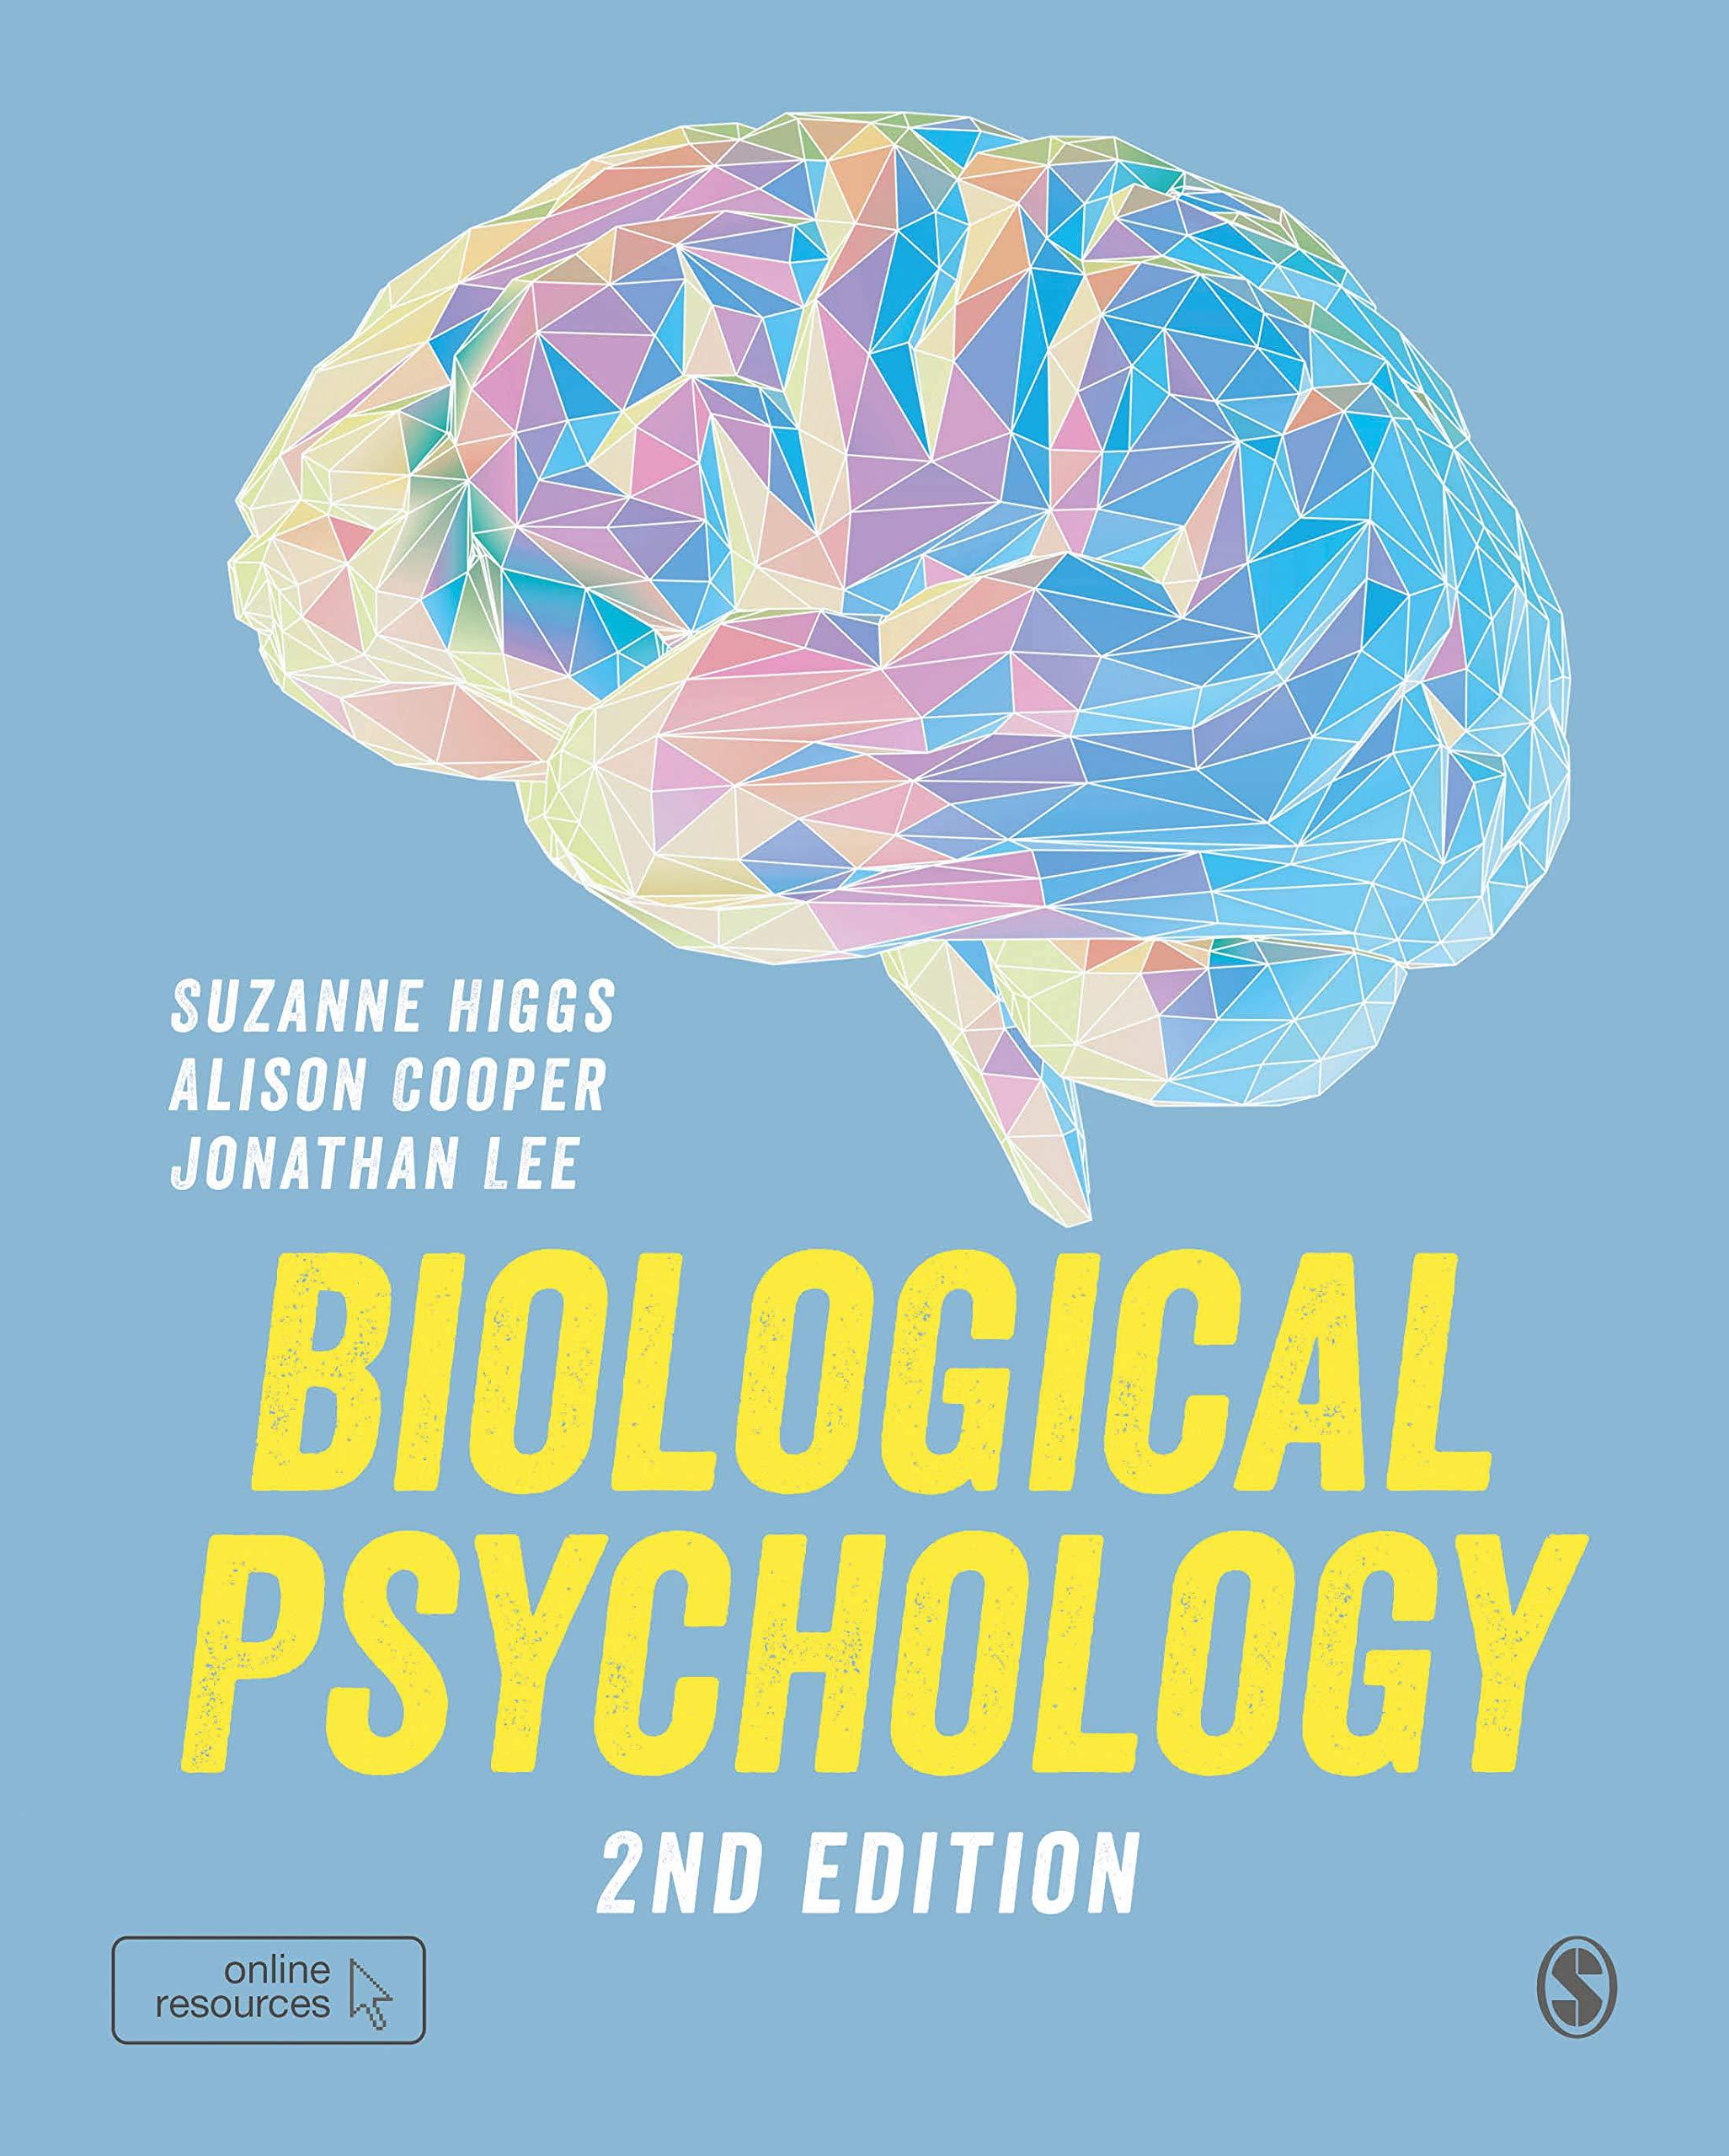 Biological Psychology Amazon Co Uk Suzanne Higgs Alison